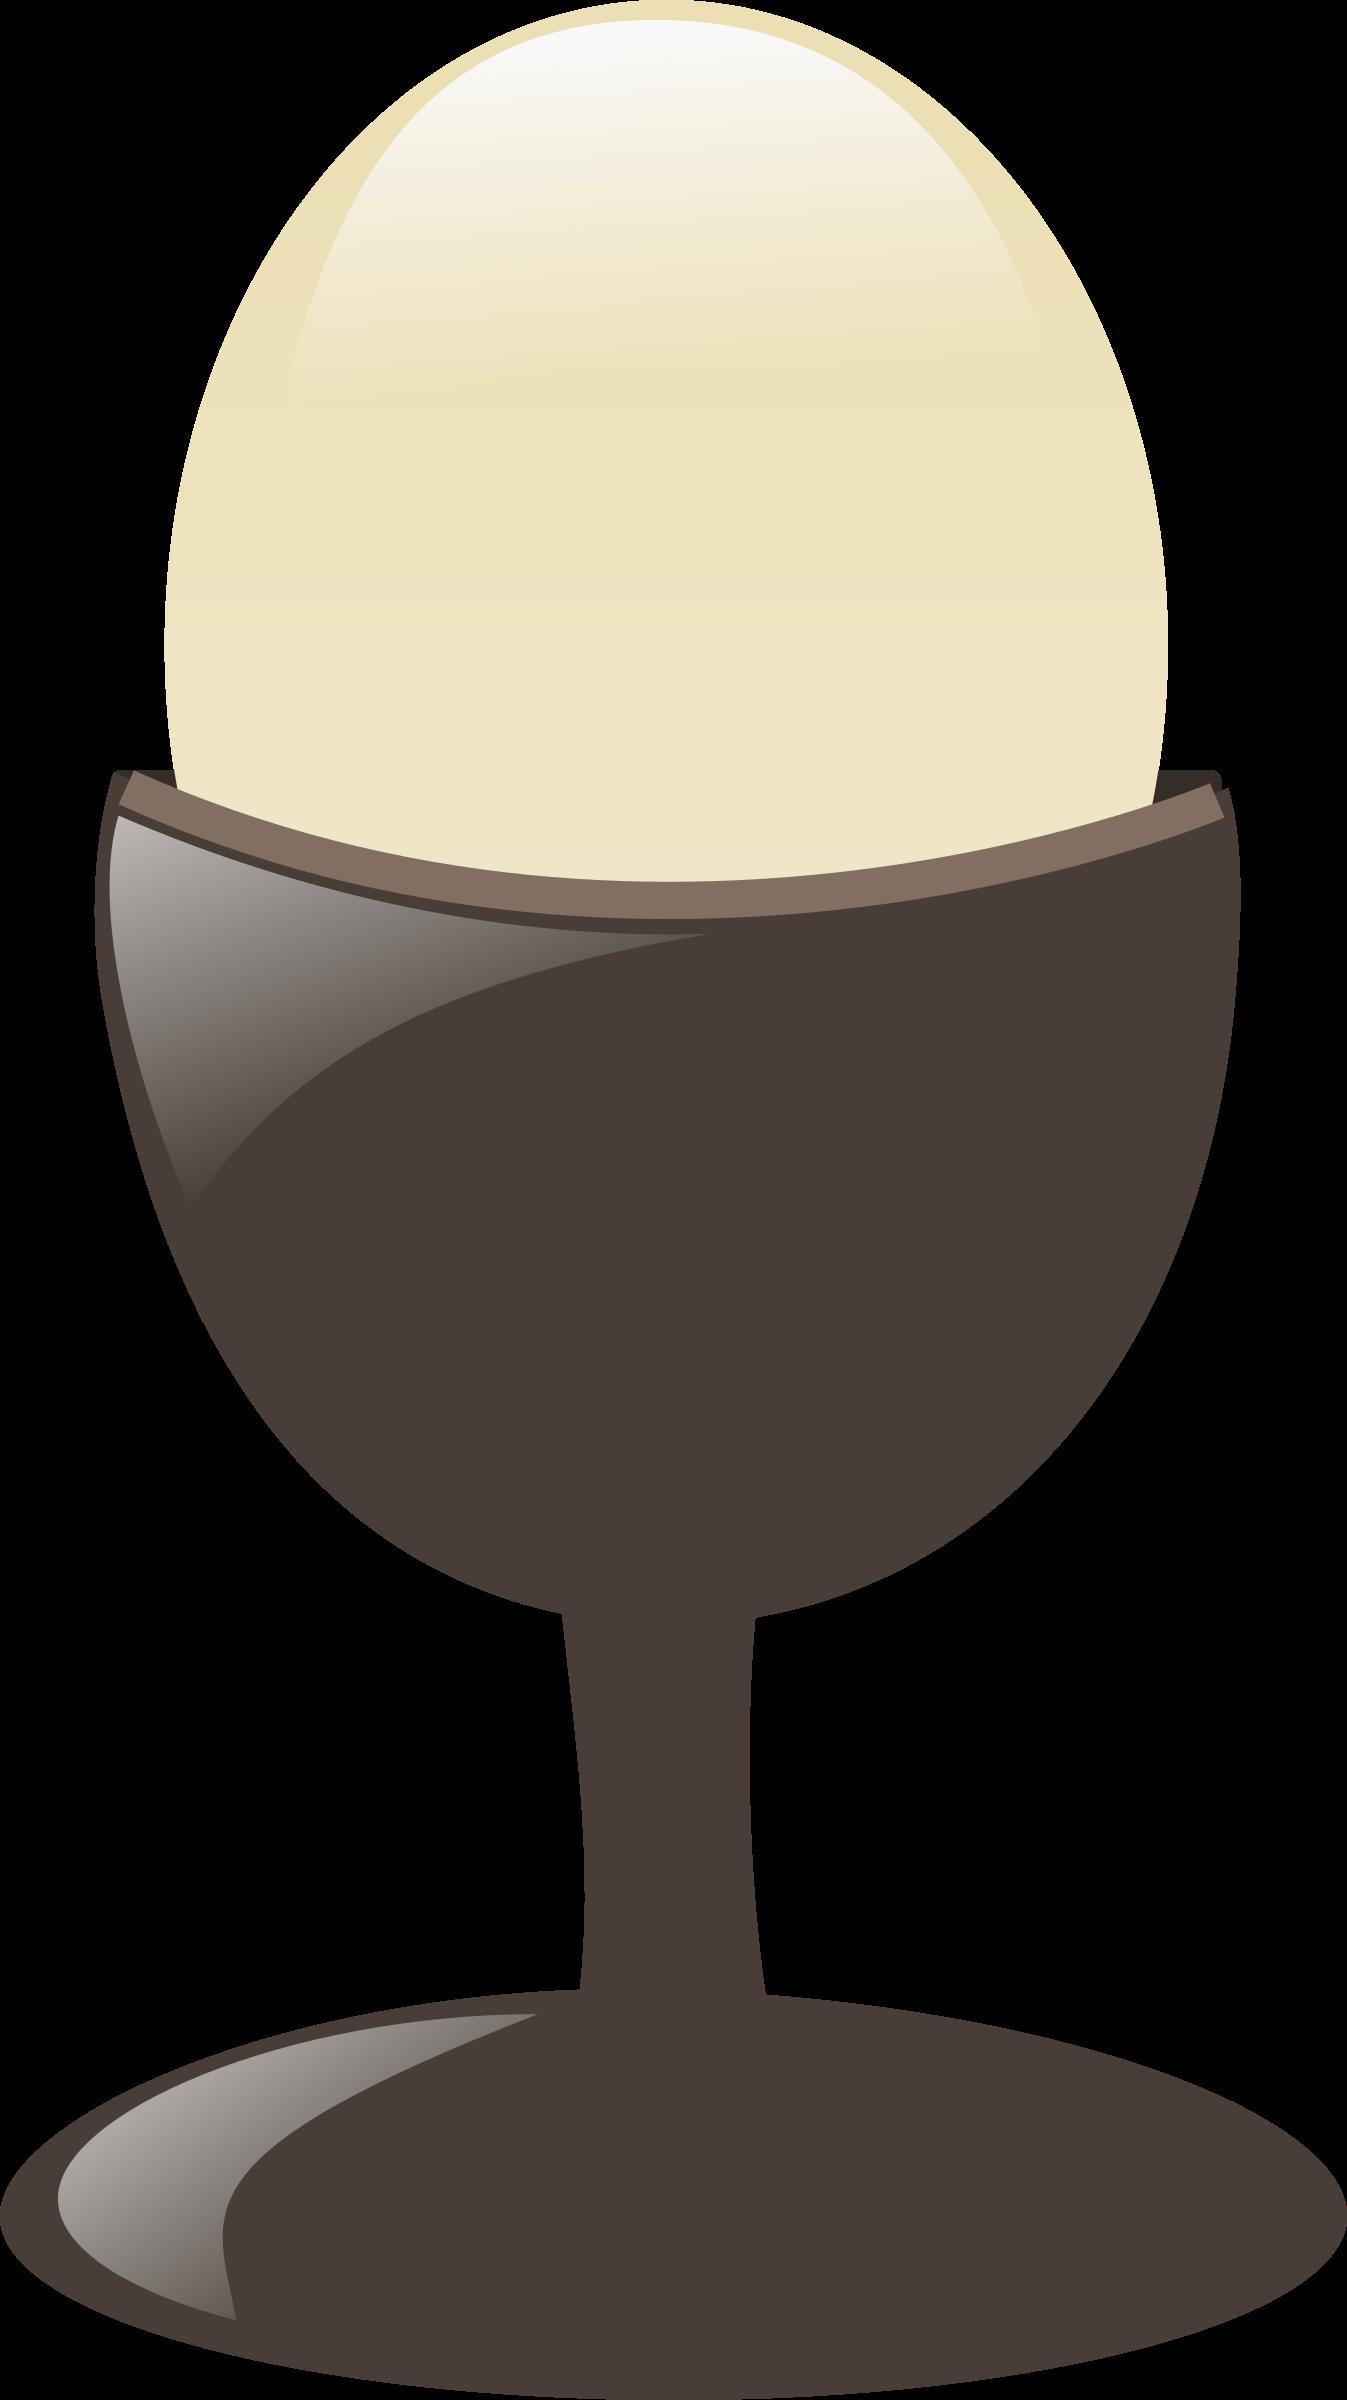 Egg gambar